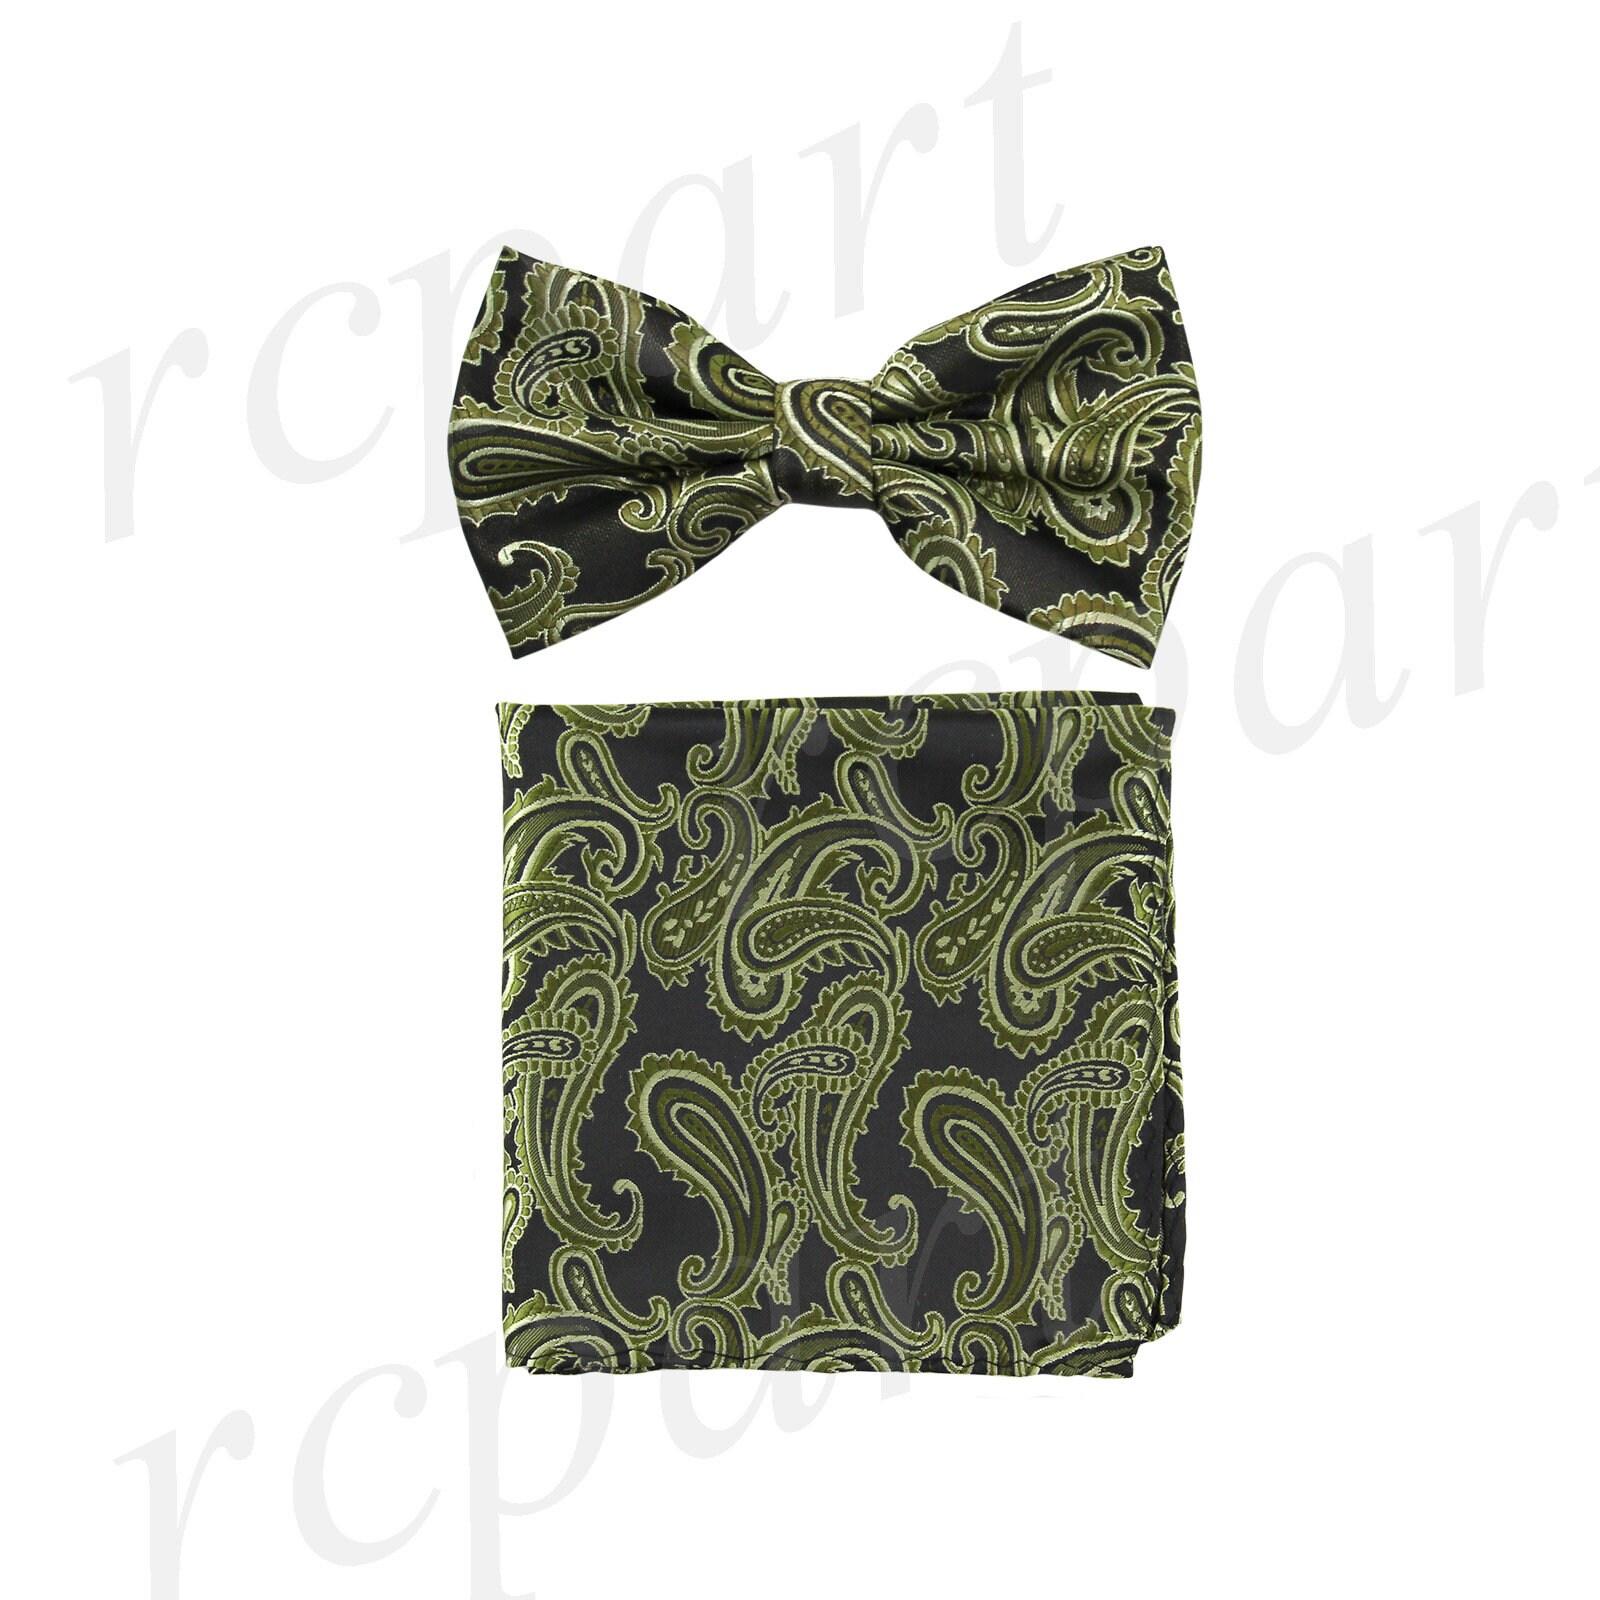 New formal Men/'s micro fiber Pre-tied Bow Tie /& Hankie Hankie red paisley